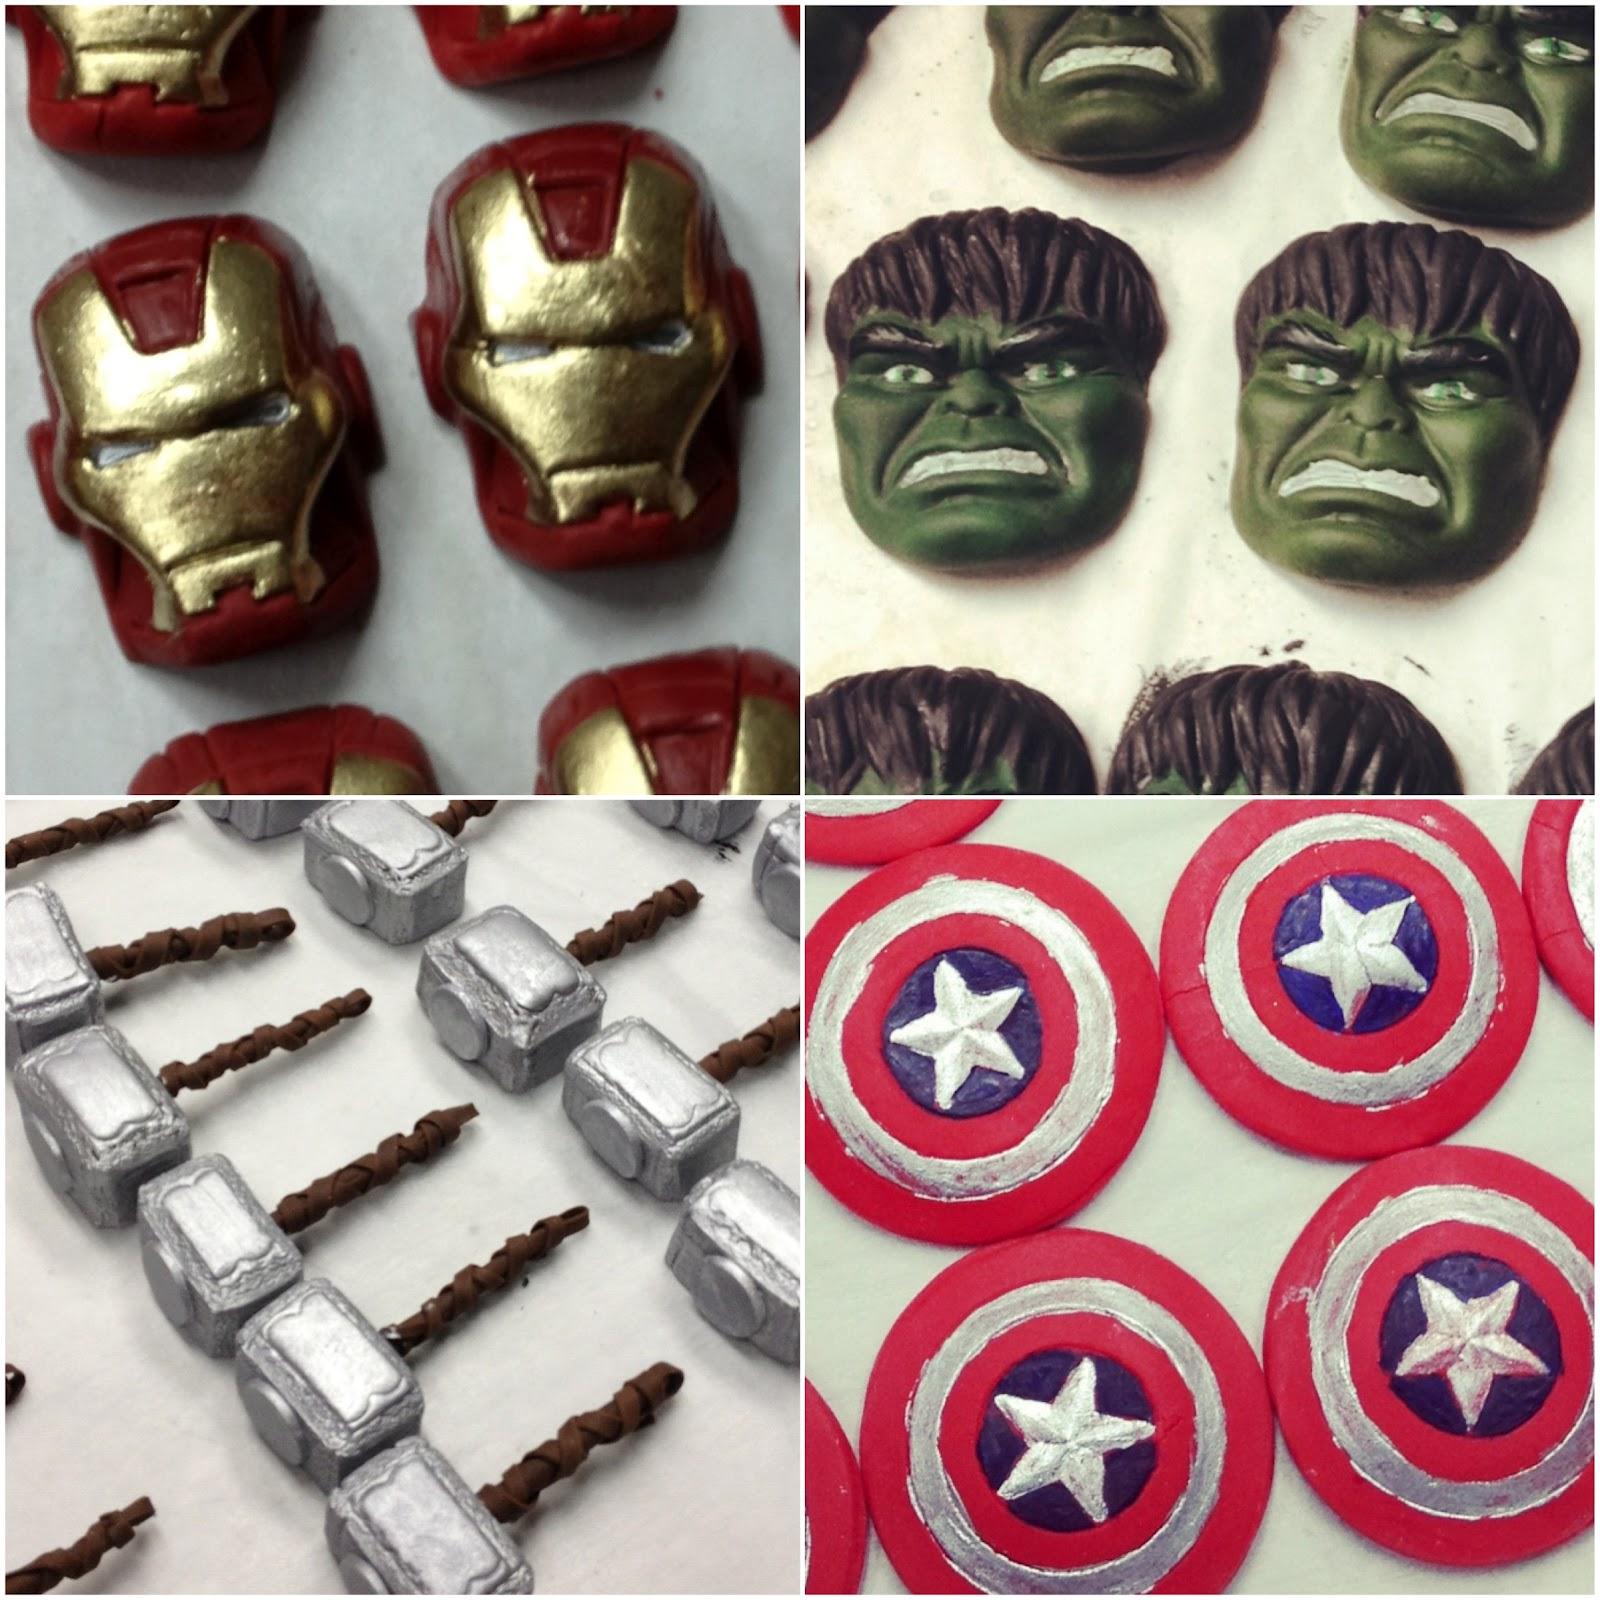 http://4.bp.blogspot.com/-DZ6Zwv360Uw/T6NVD6benBI/AAAAAAAAAZo/BSqnYyweJu8/s1600/The+Cake+Mamas+Avengers.jpg